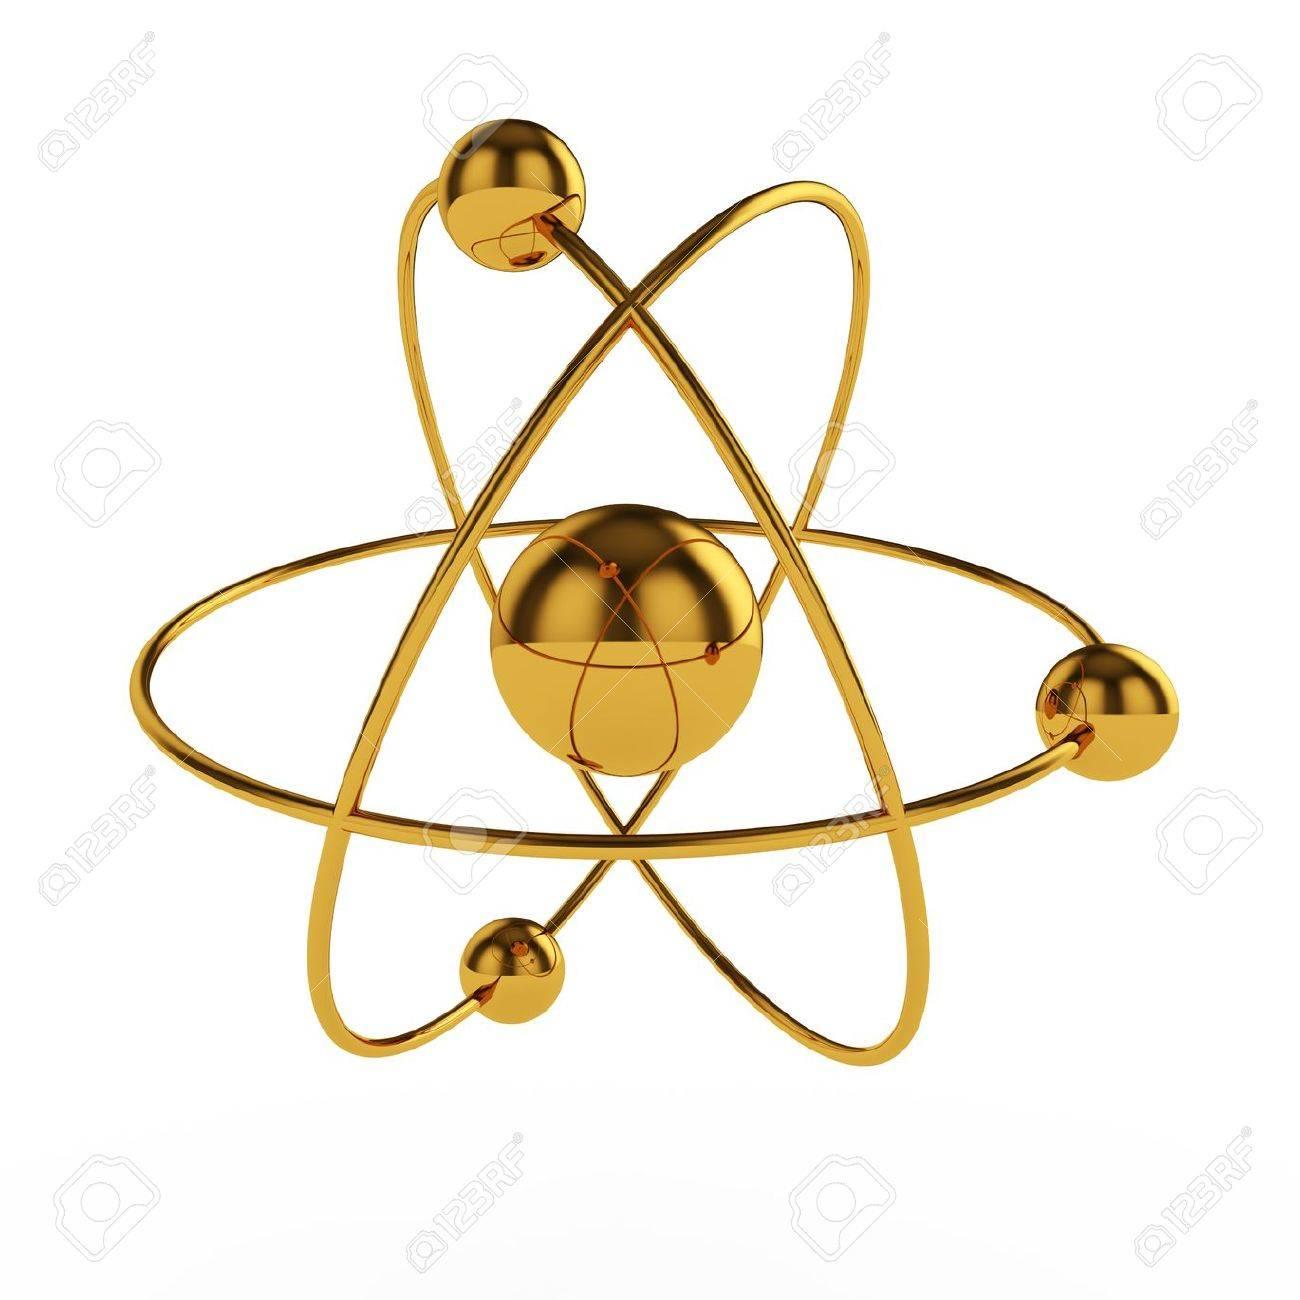 hight resolution of 3d illustration of golden atom model isolated on white background stock illustration 13044094